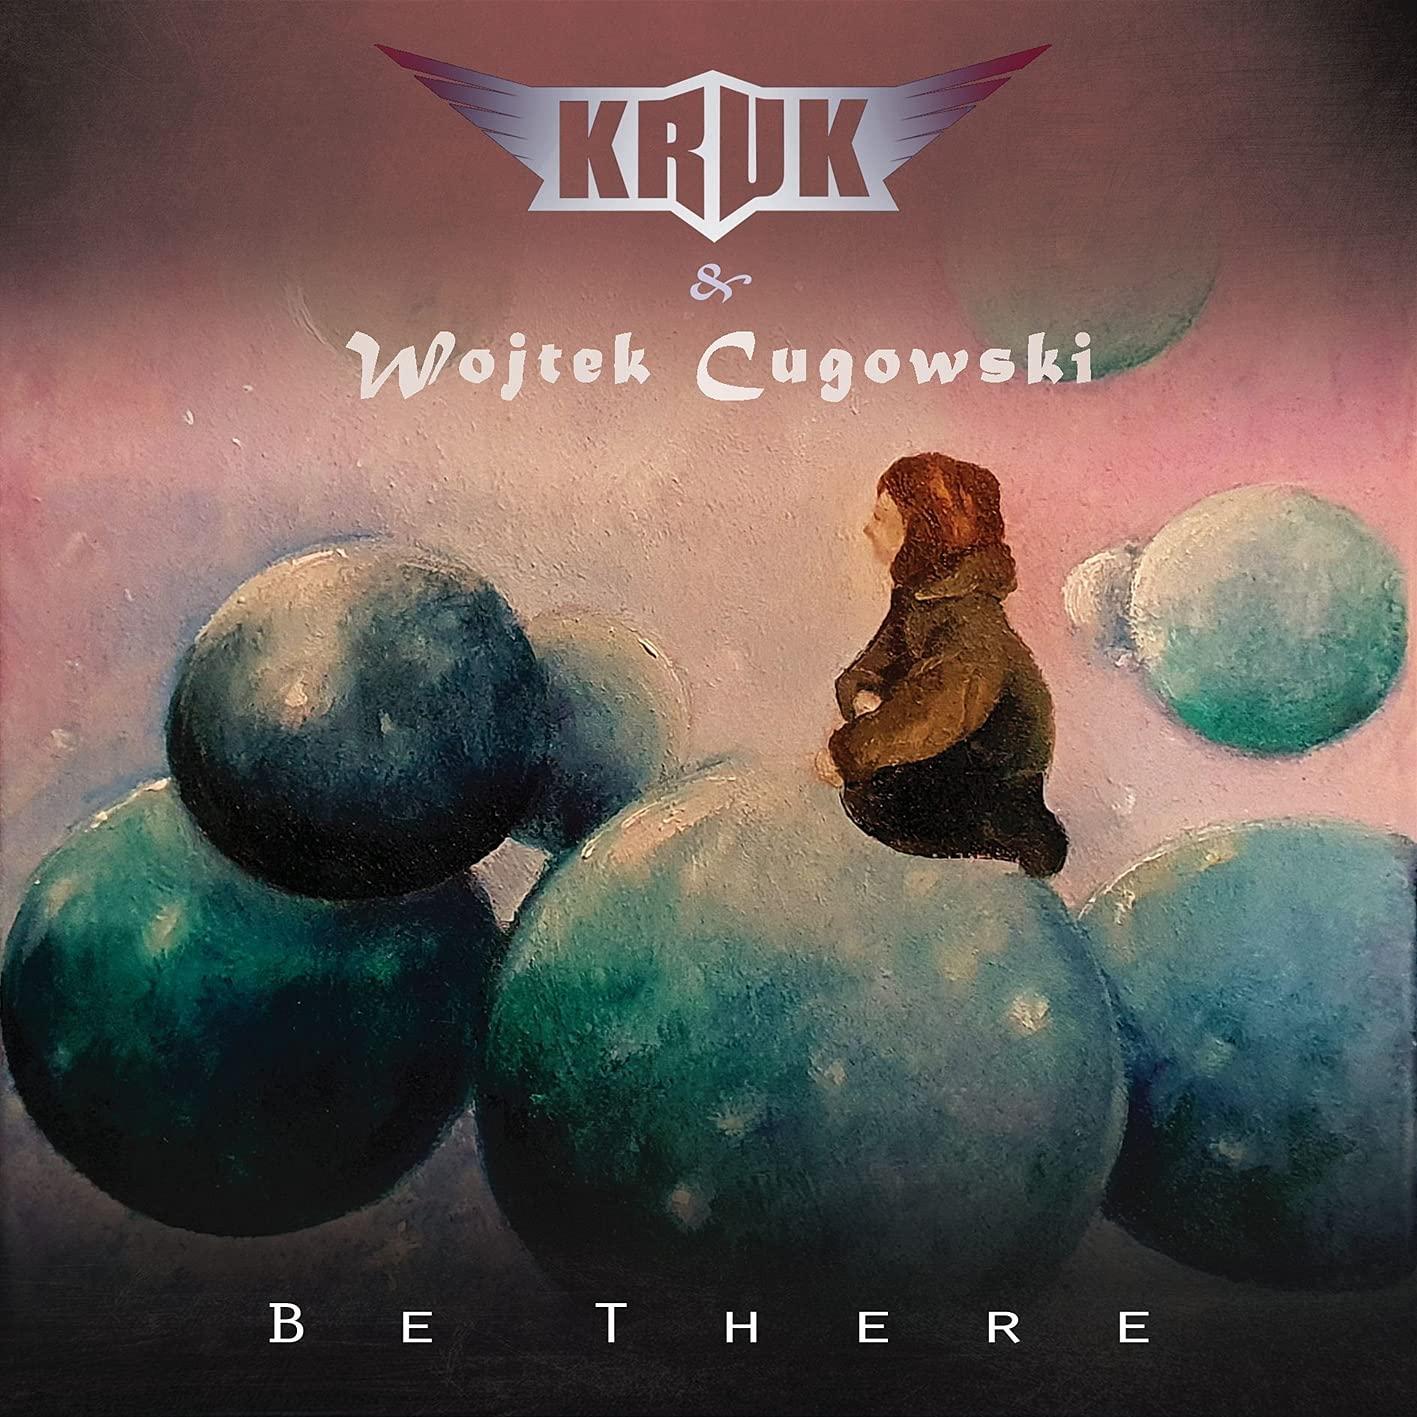 Kruk & Wojtek Cugowski - Be There (2021) [FLAC] Download